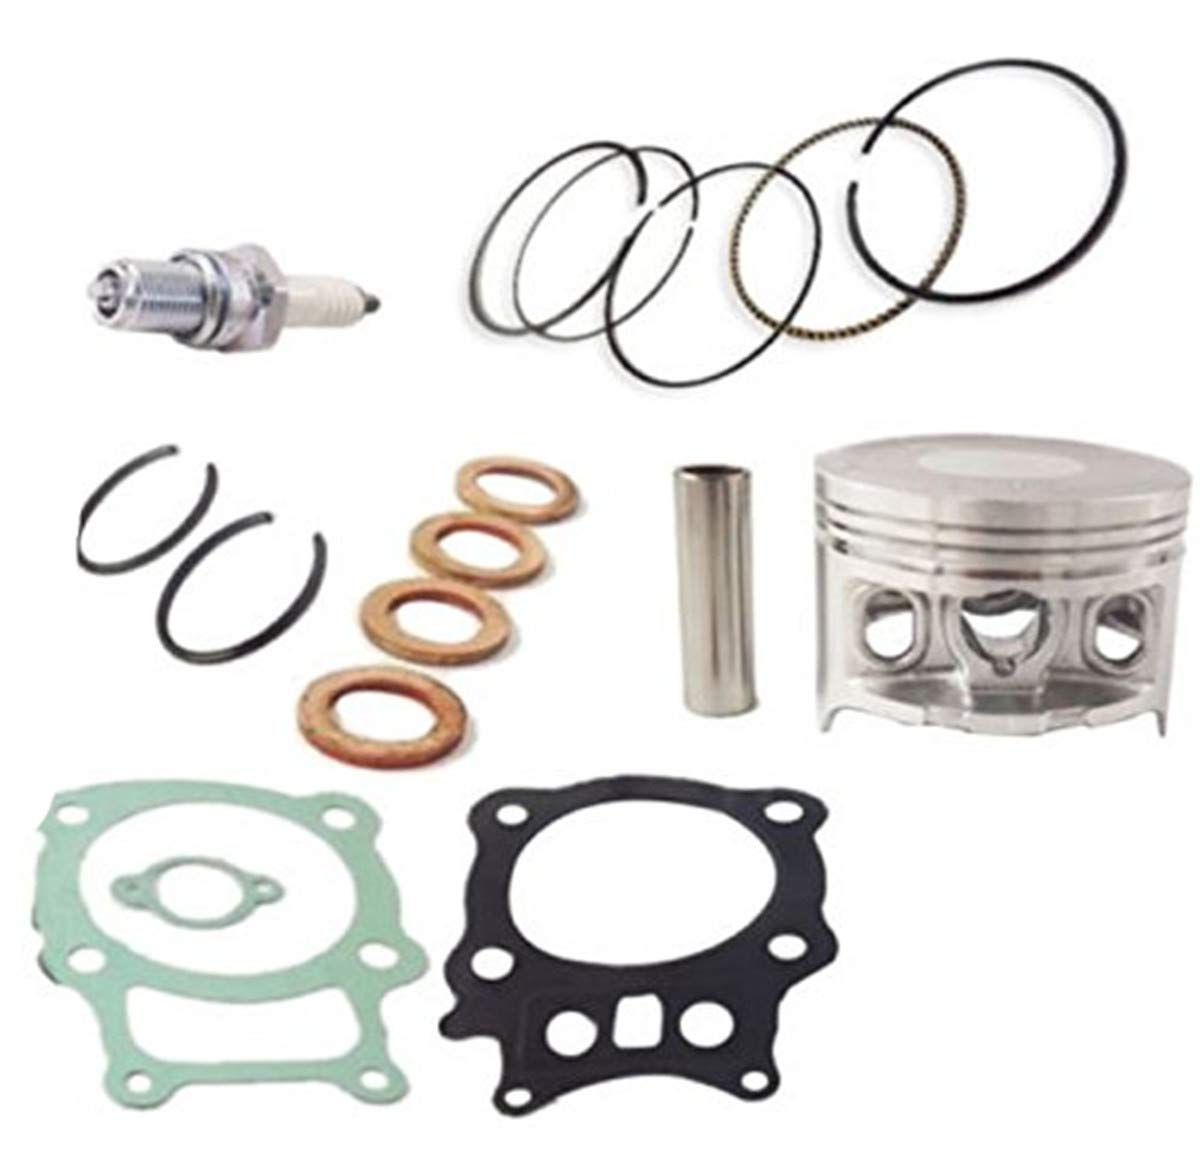 Qauick Piston Gasket Top End Kit for Honda Rancher 350 TRX350 TRX350FE TRX350FM TRX350TE TRX350TM ATV Quad 2000-2006 Replace OEM # 13101-HN5-670 12100-HN5-670